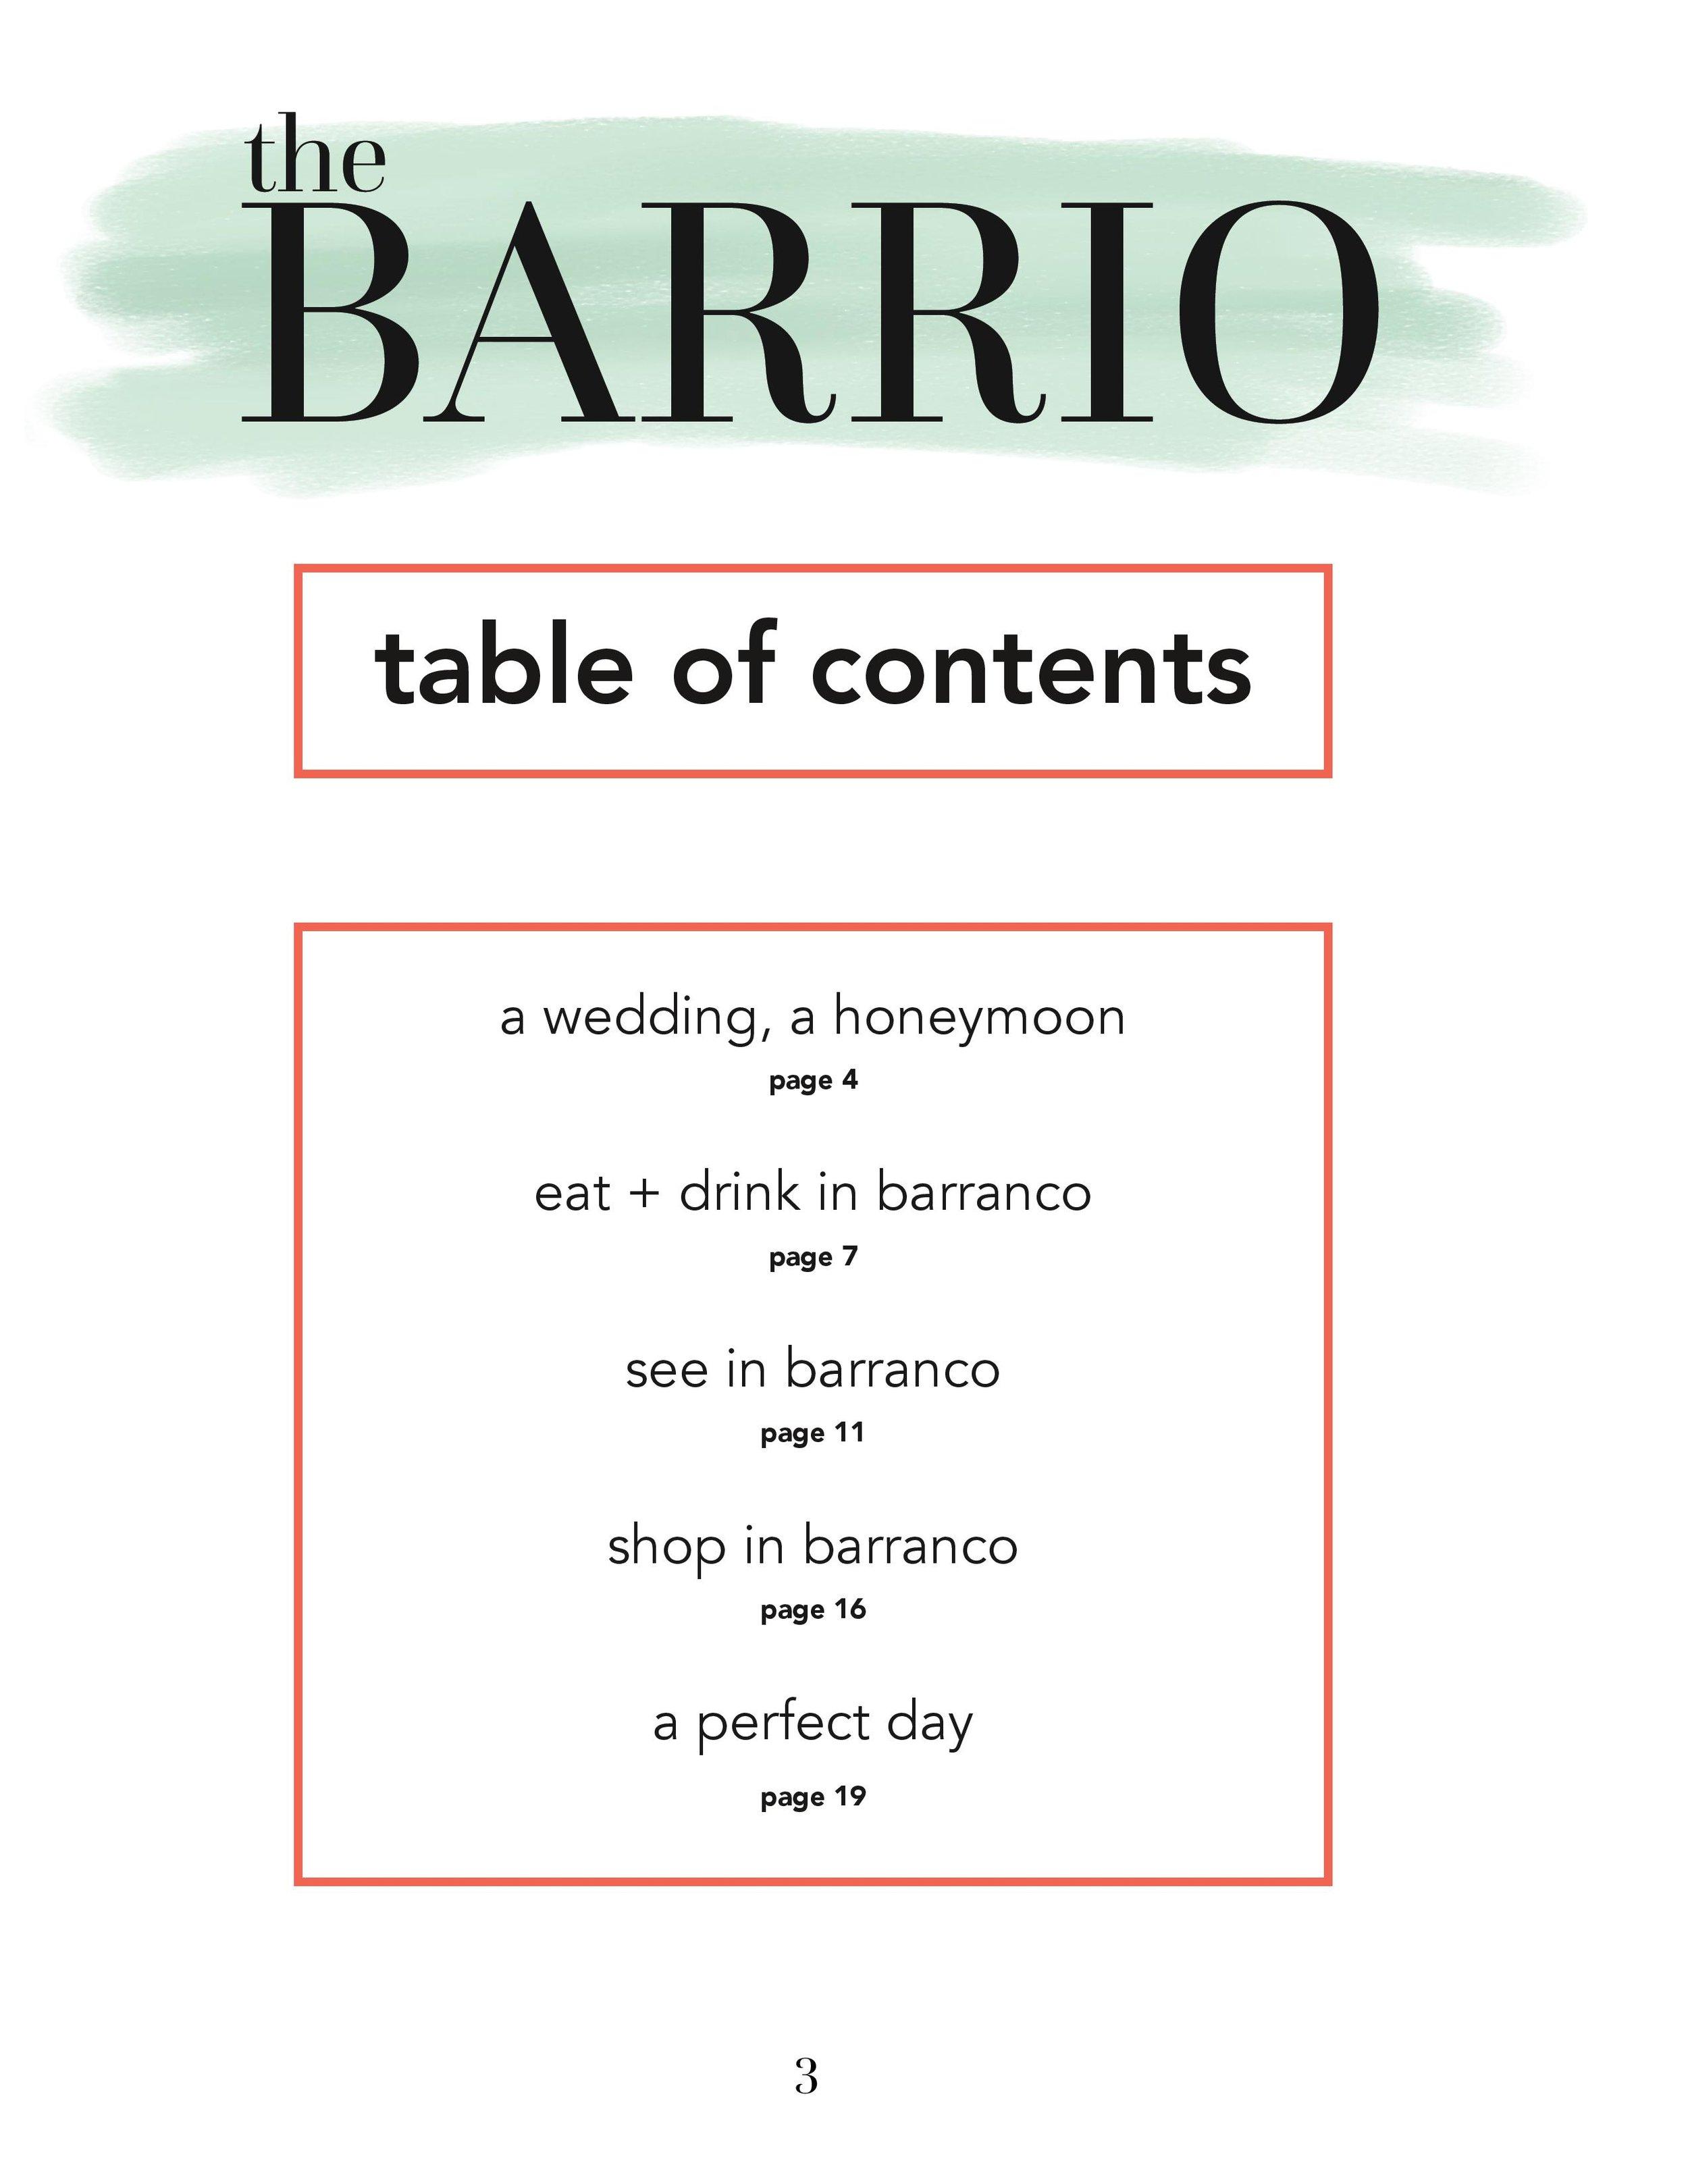 barrio_5.22-page-003.jpg